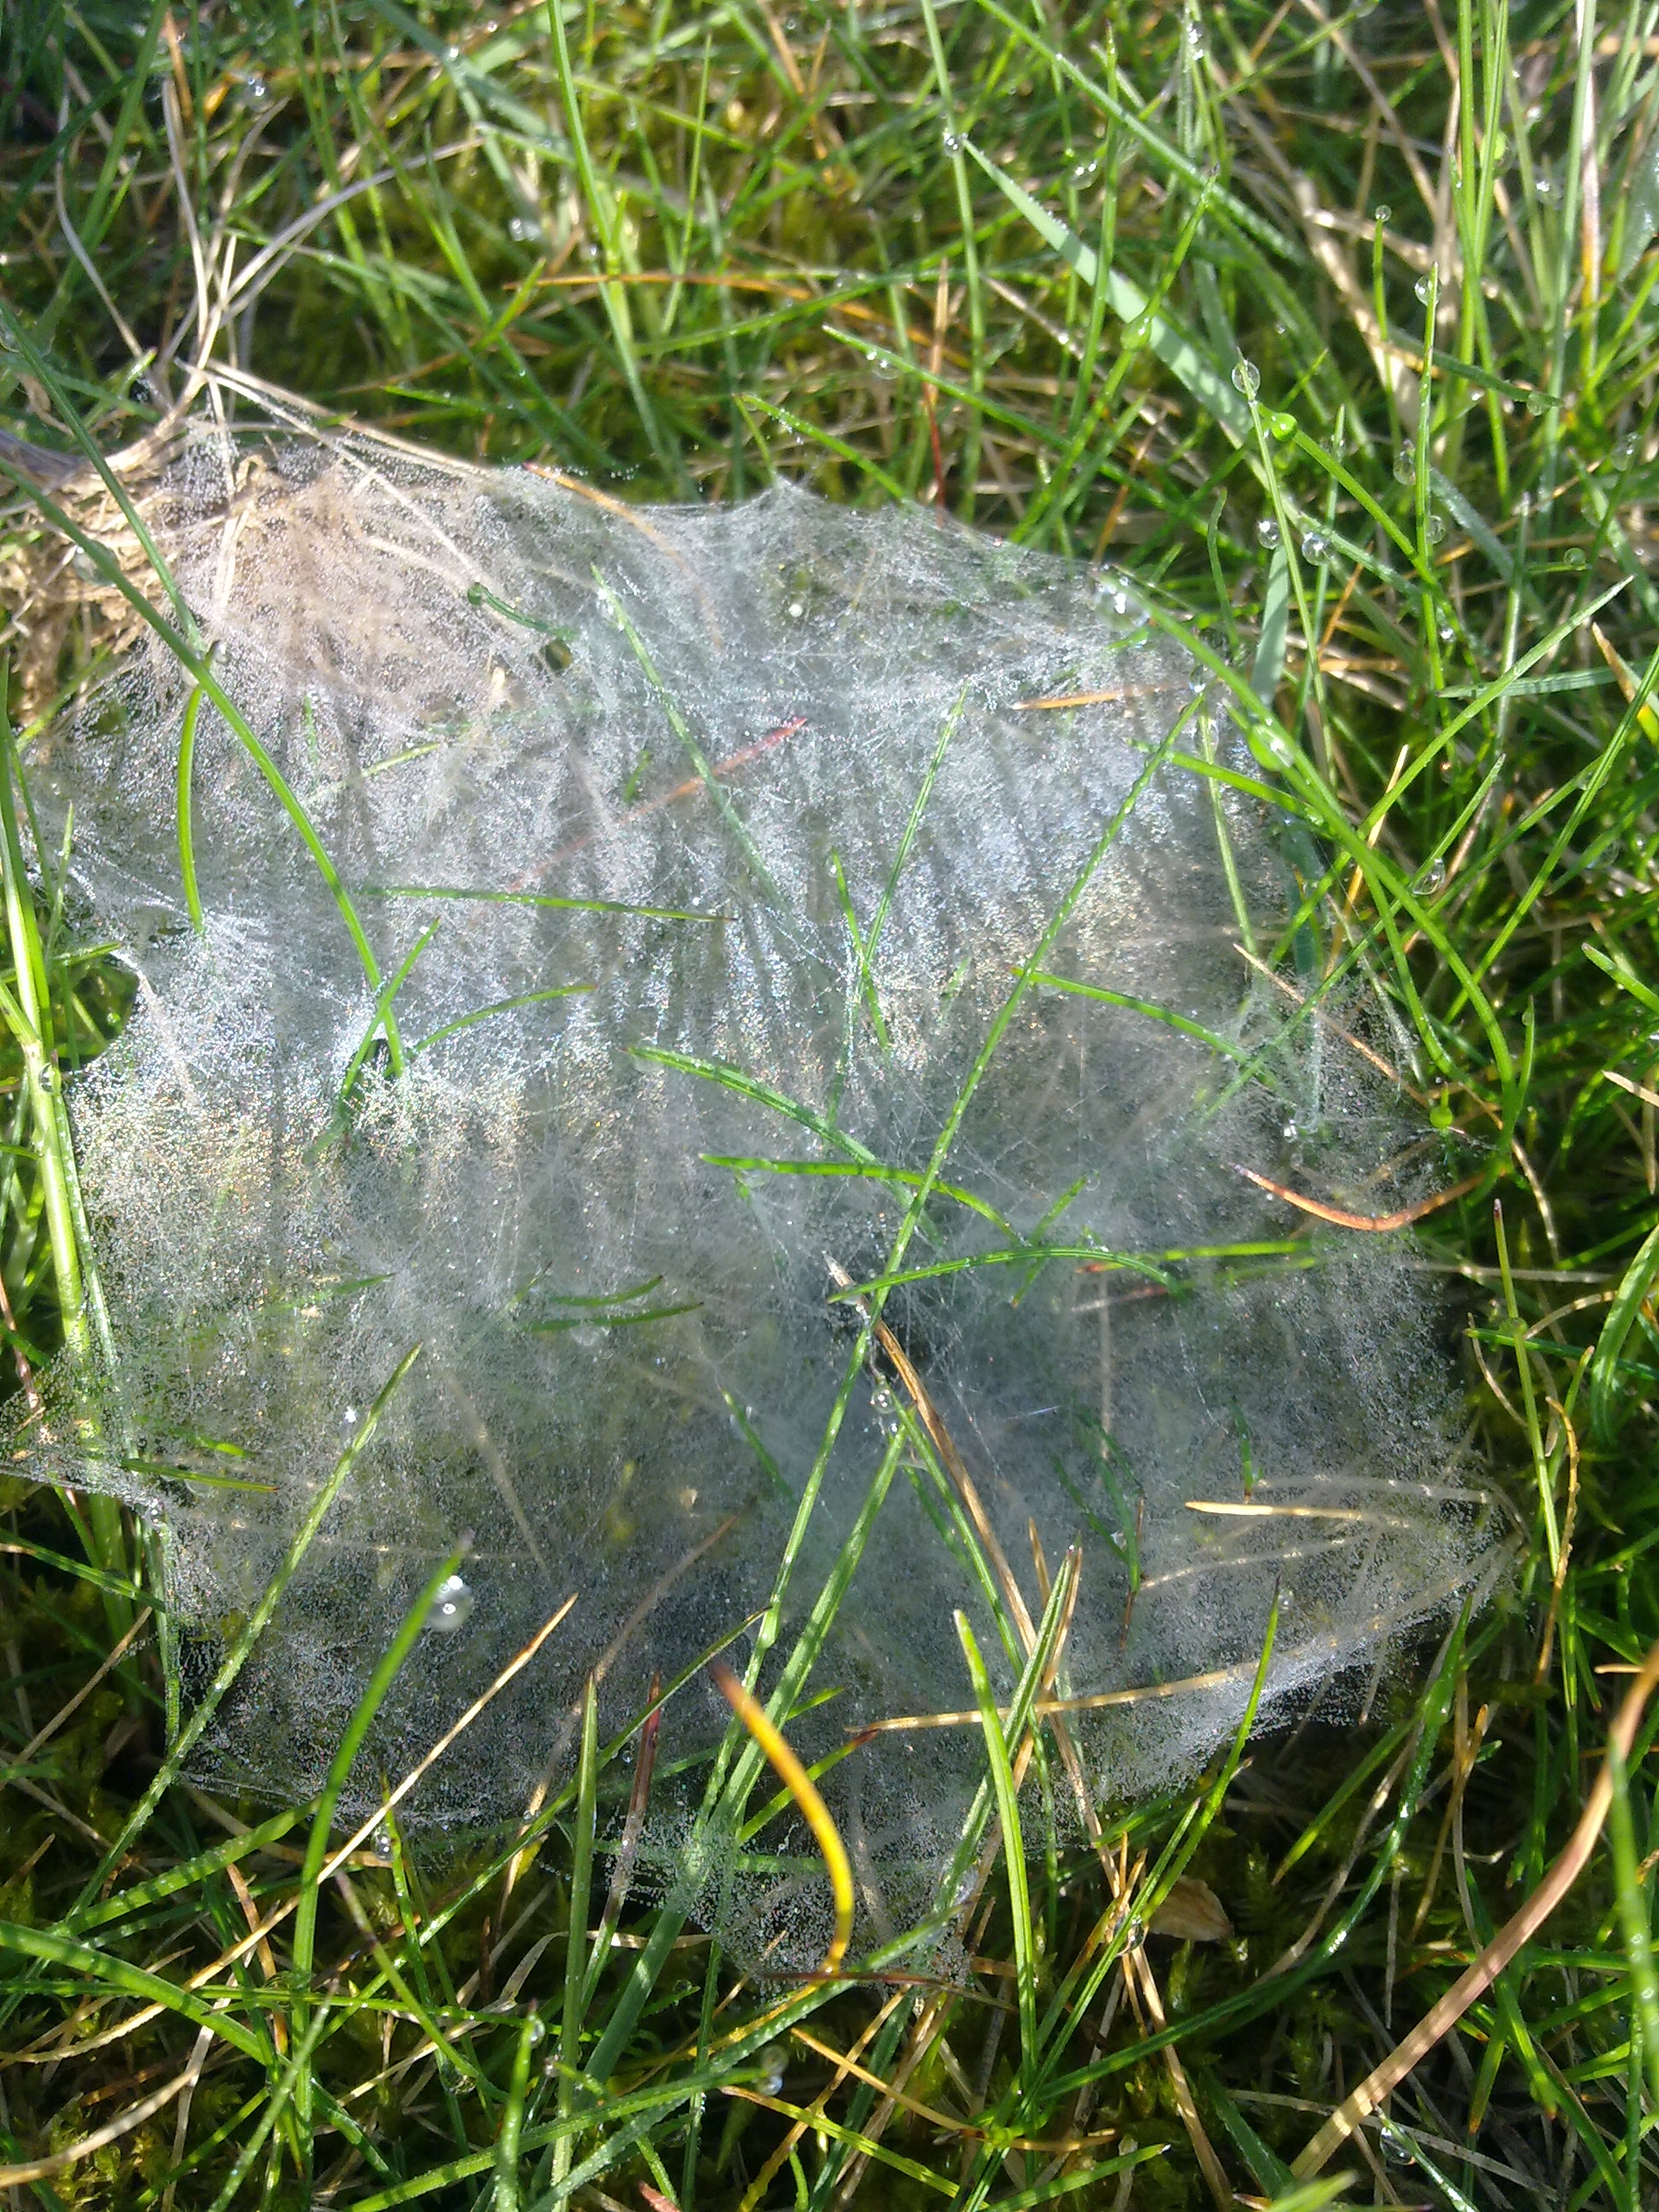 file toile d araign 233 e dans l herbe 224 grez doiceau 004 jpg wikimedia commons